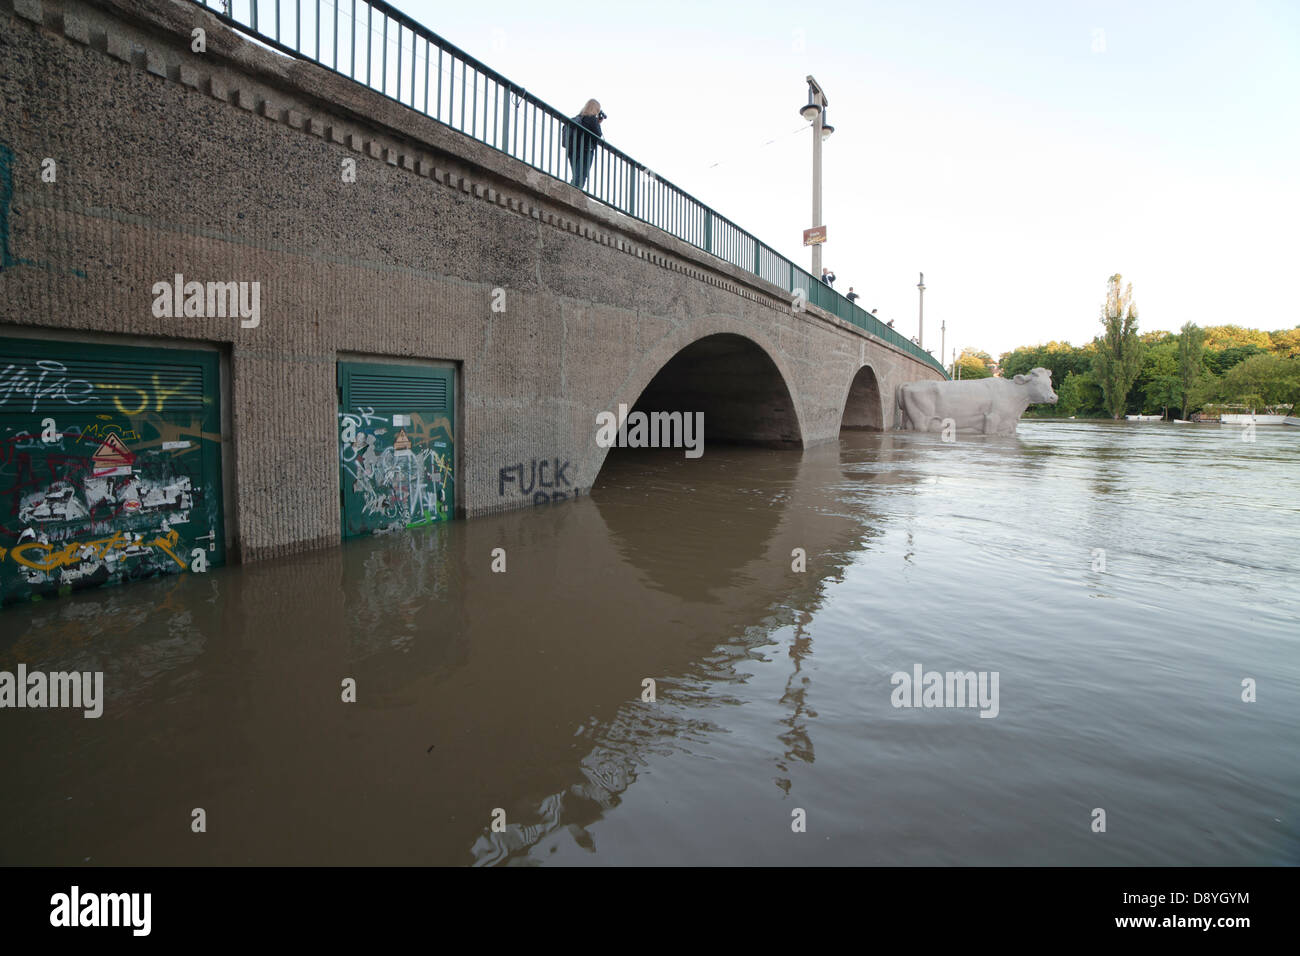 bridge Giebichenstein during flood of river Saale in Halle; Halle (Saale), Germany, 5th  June 2013 - Stock Image